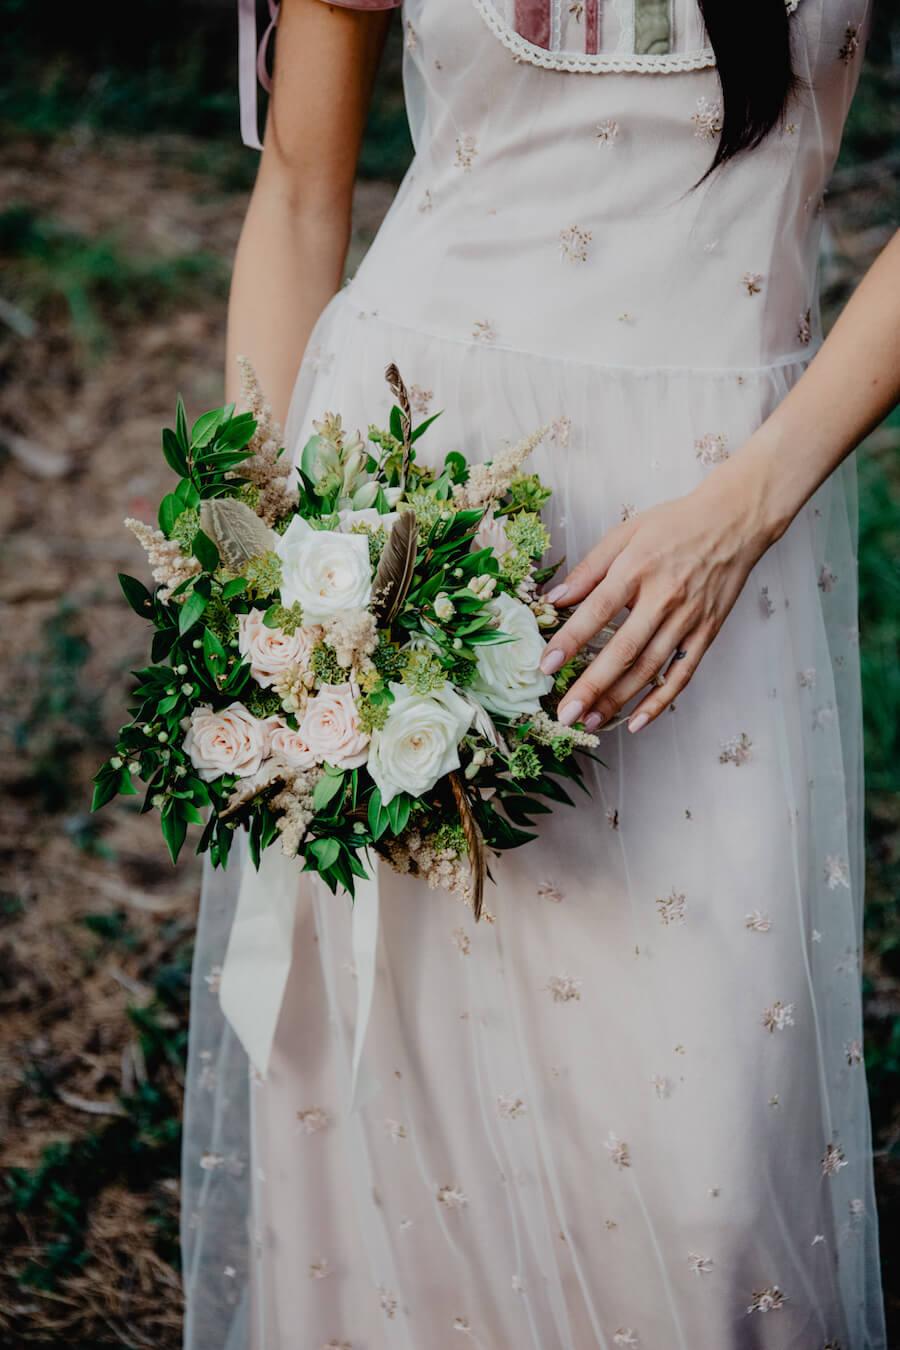 matrimonio-a-tema-stelle-in-pineta-federica-cosentino-5